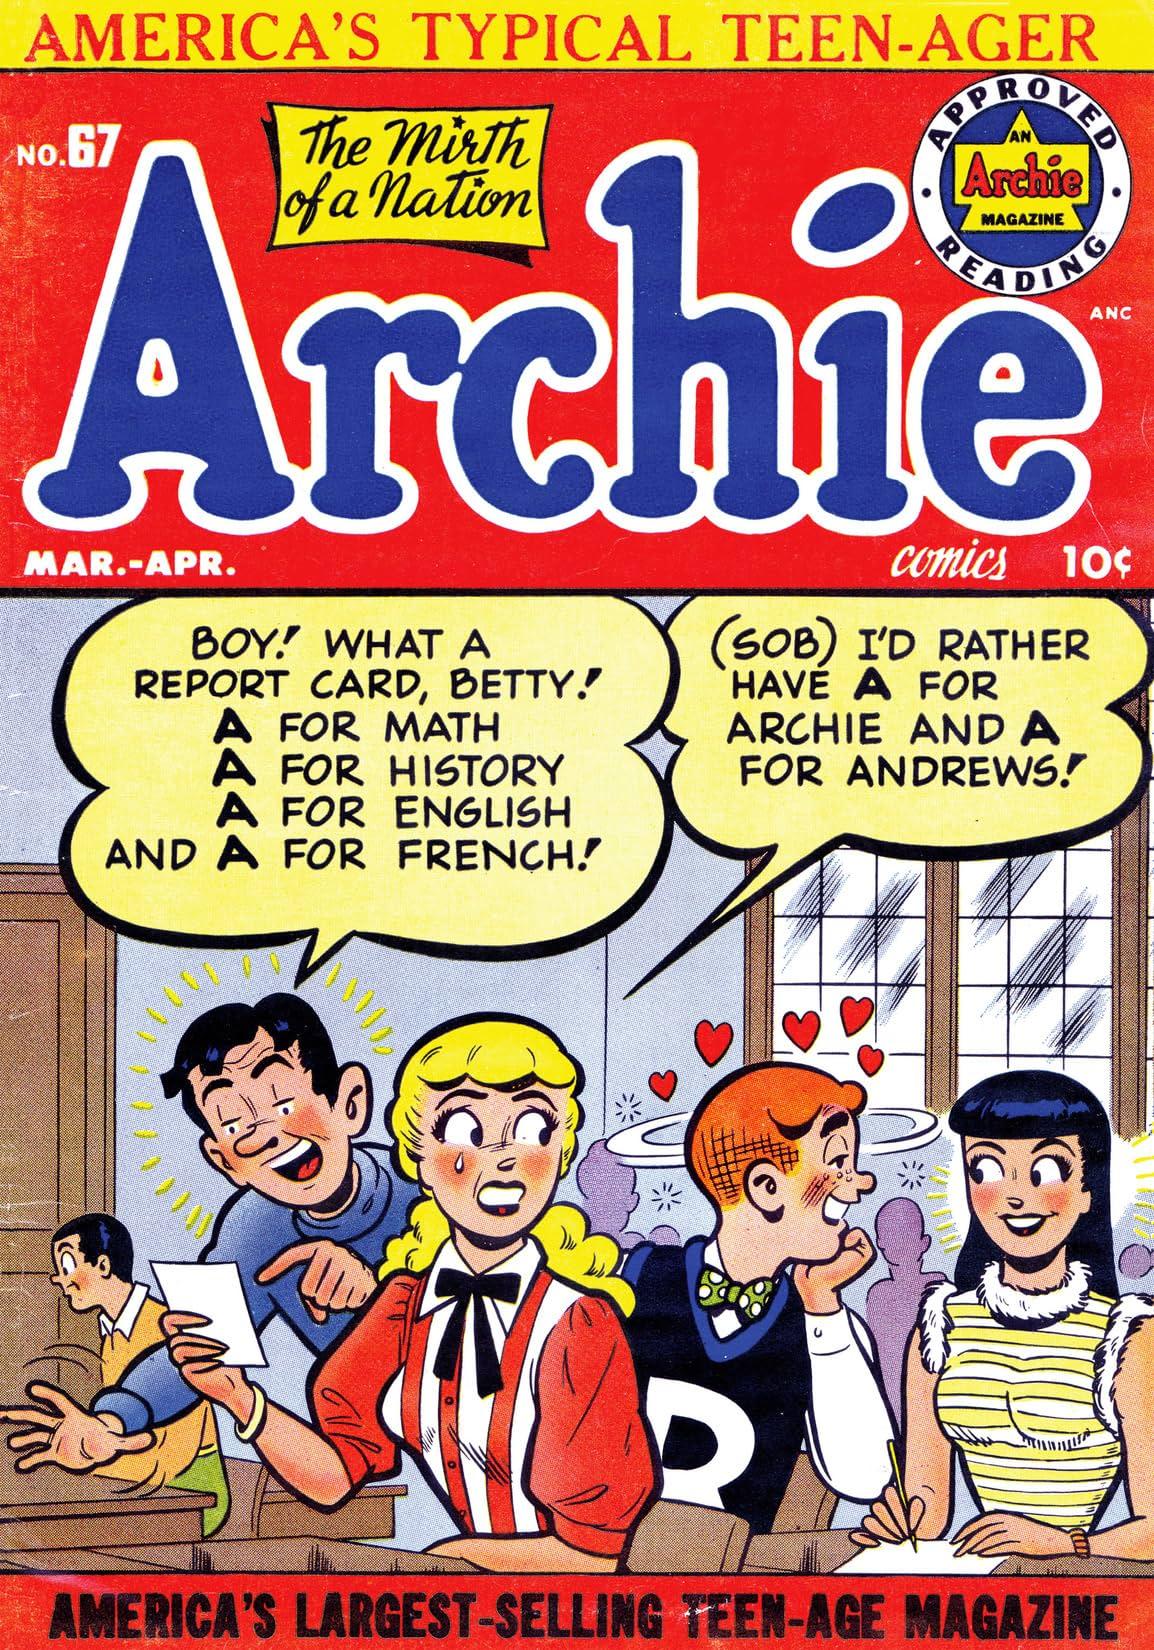 Archie #67